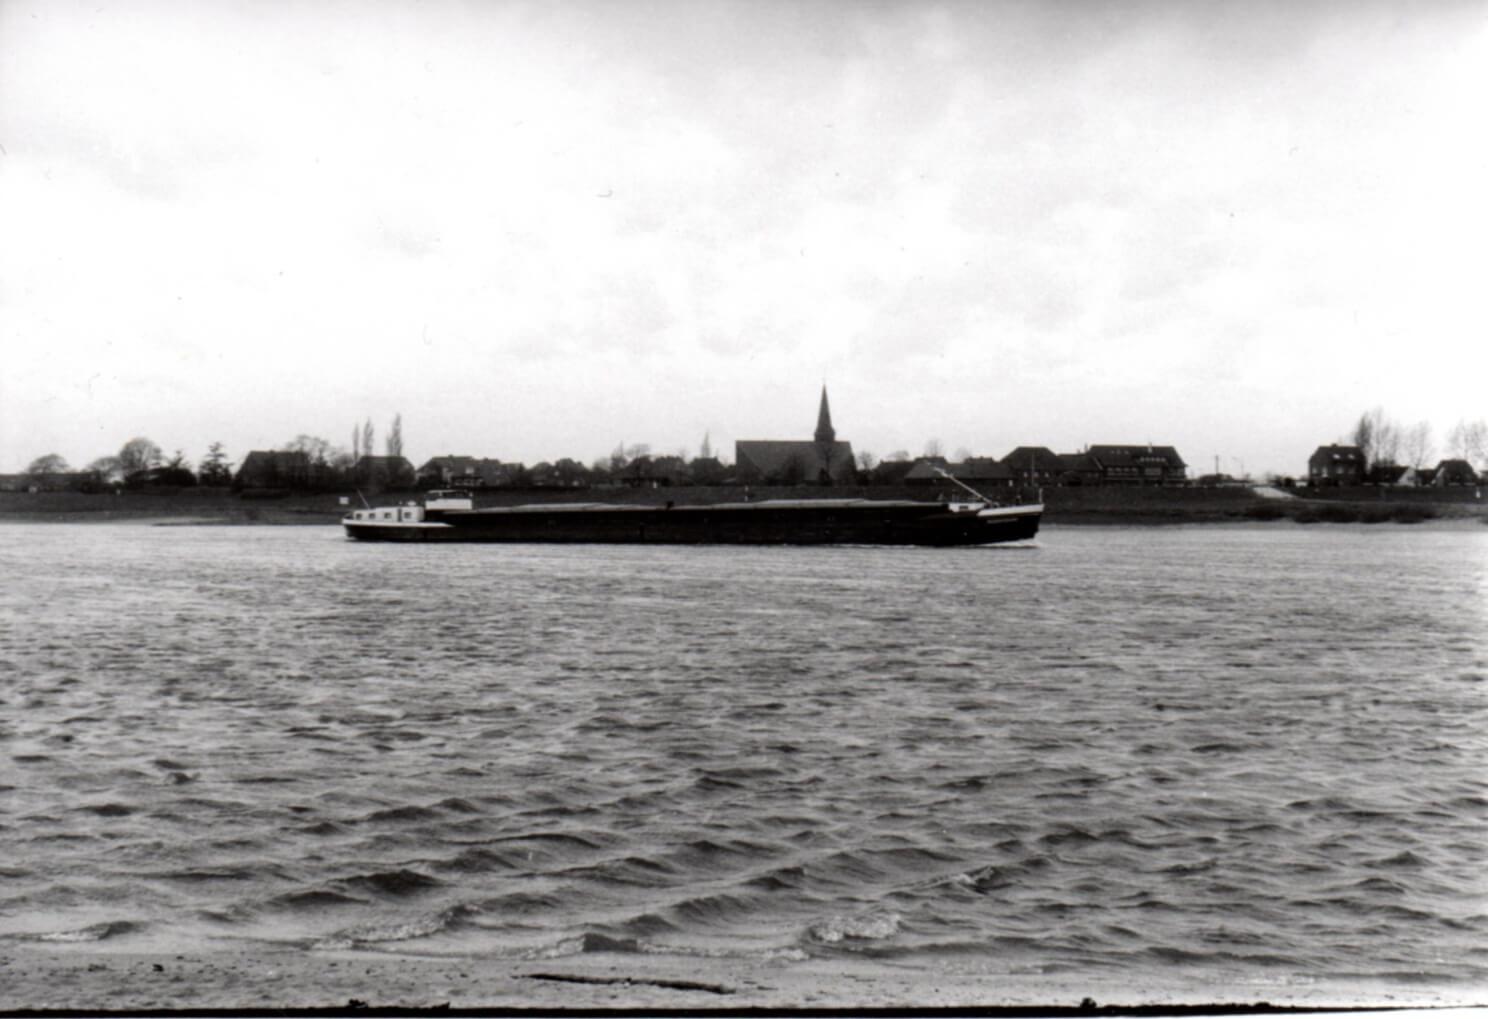 HANS-PETER FELDMANN. Time Series – Ship on the Rhine, 1970's (Detail) | Accrochage #3: Footnote nº 10 | ProjecteSD